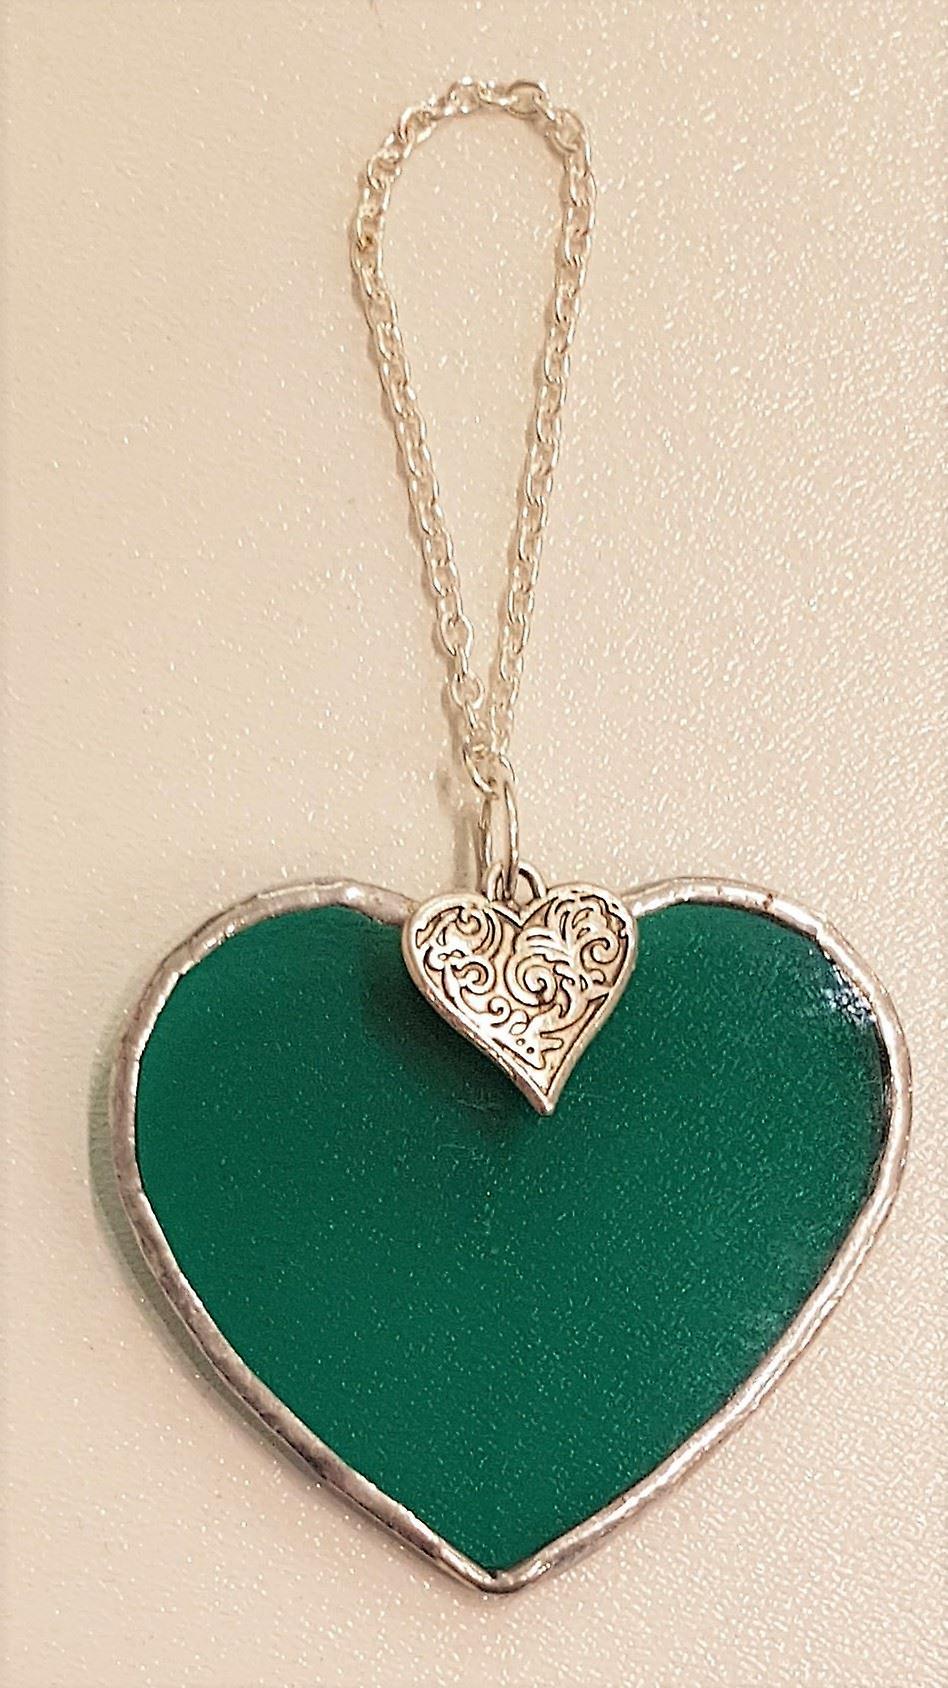 Simmerdim Design Small Dark Green Heart Heart